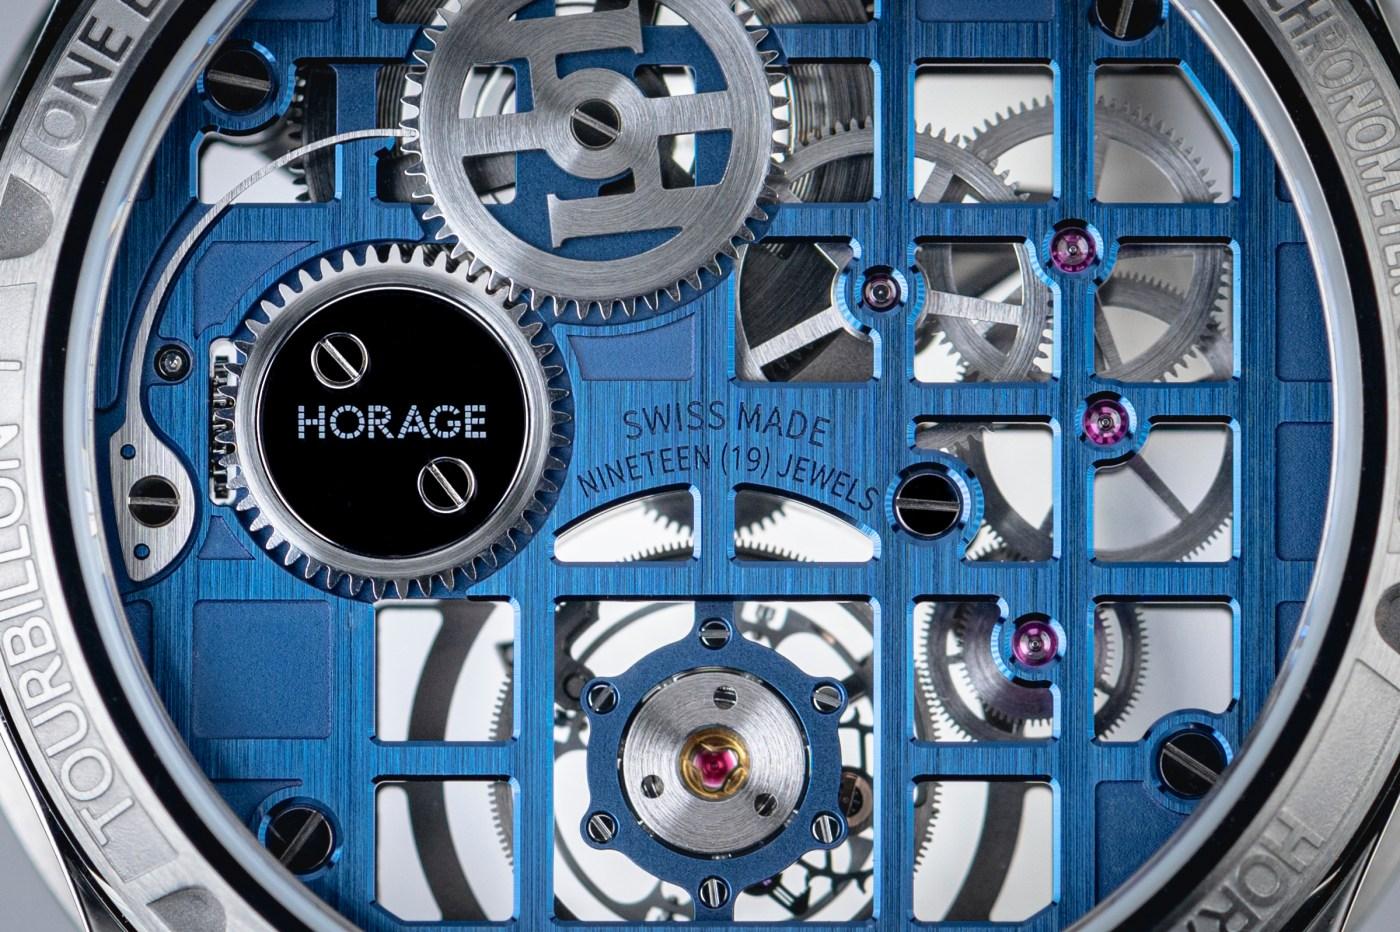 Horage Tourbillon 1 mainplate closeup